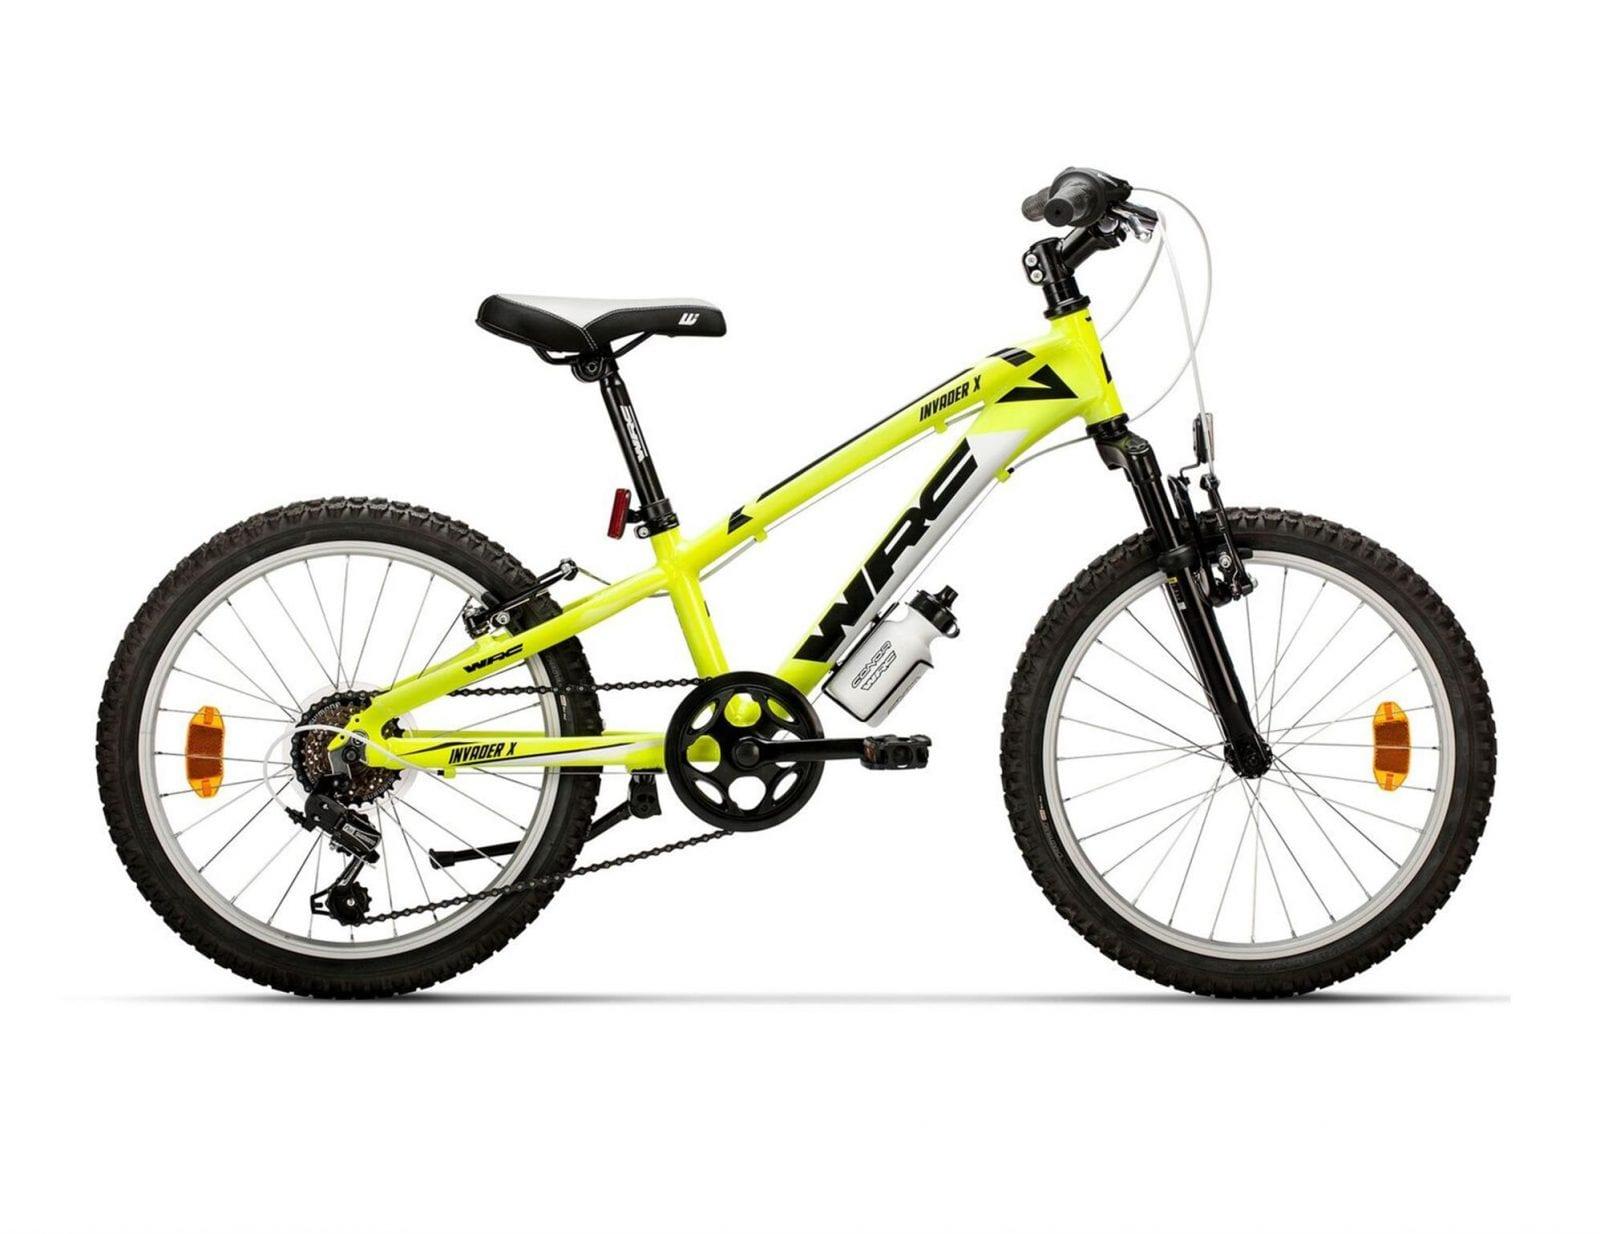 Conor-InvaderX-20-Amarilla-Vuk-Bikes-Madrid